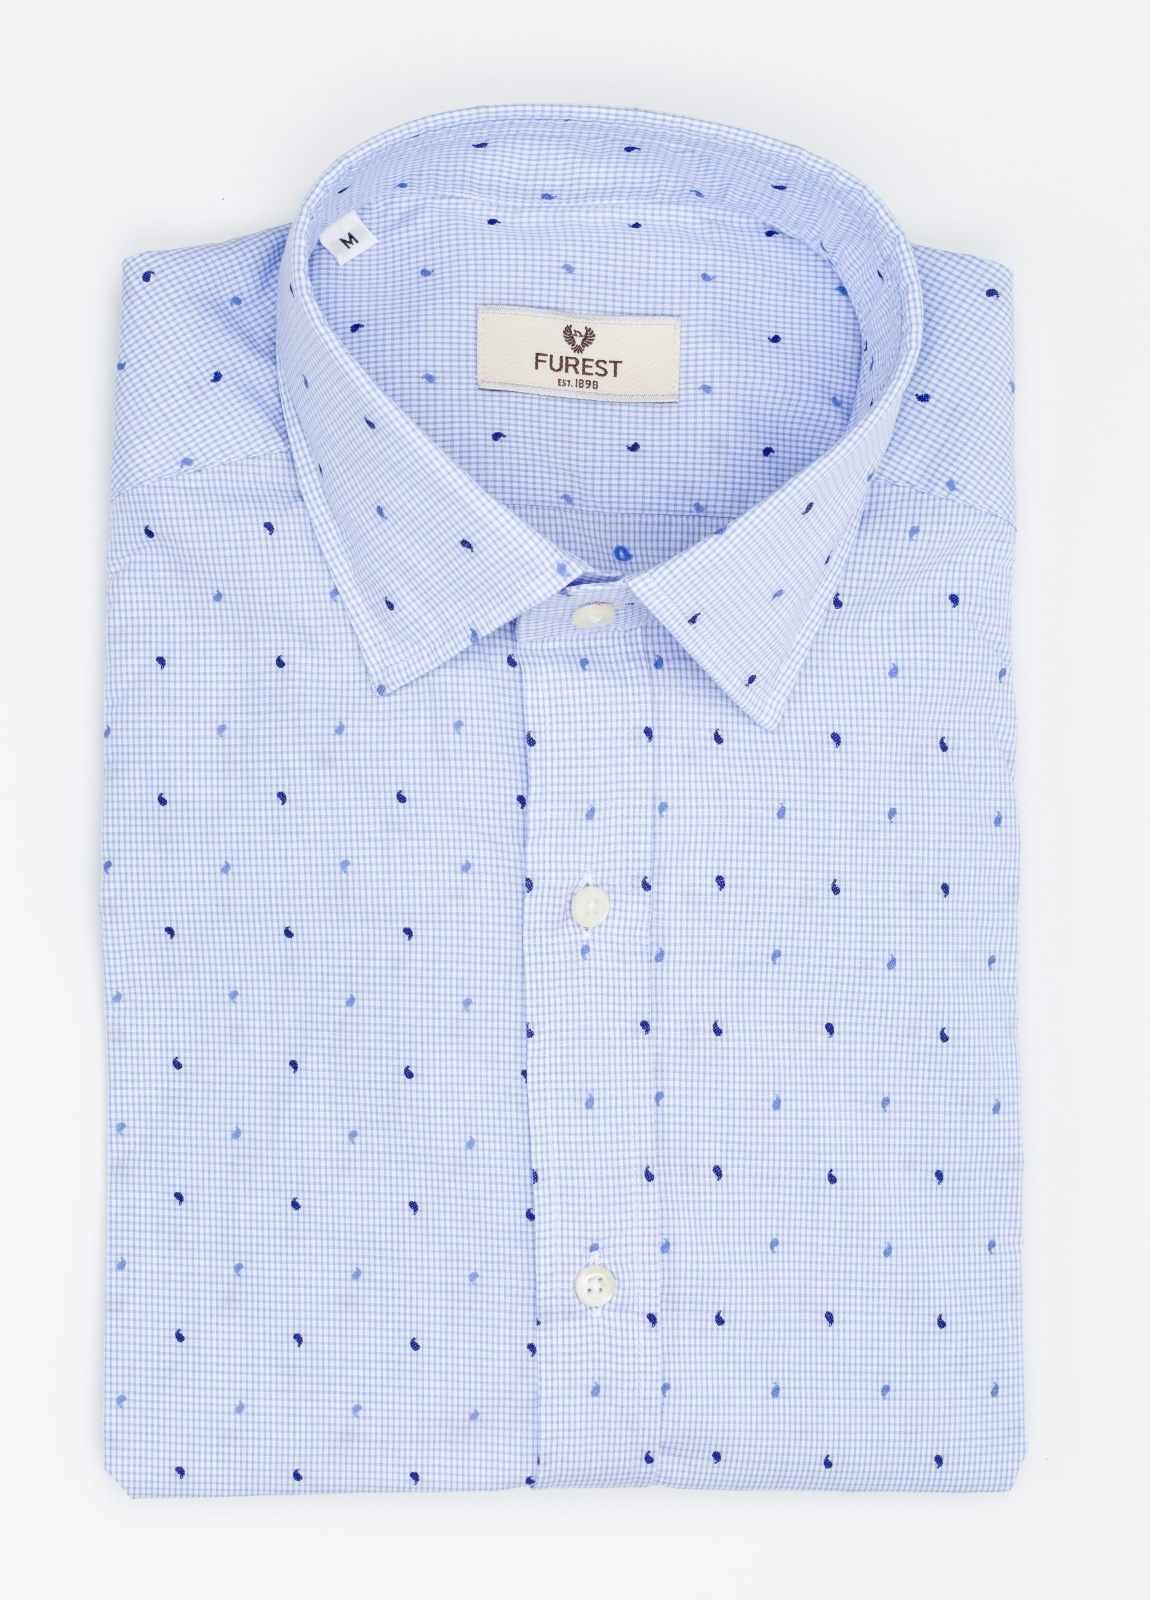 Camisa Leisure Wear SLIM FIT modelo PORTO microestampado color celeste. 100% Algodón.